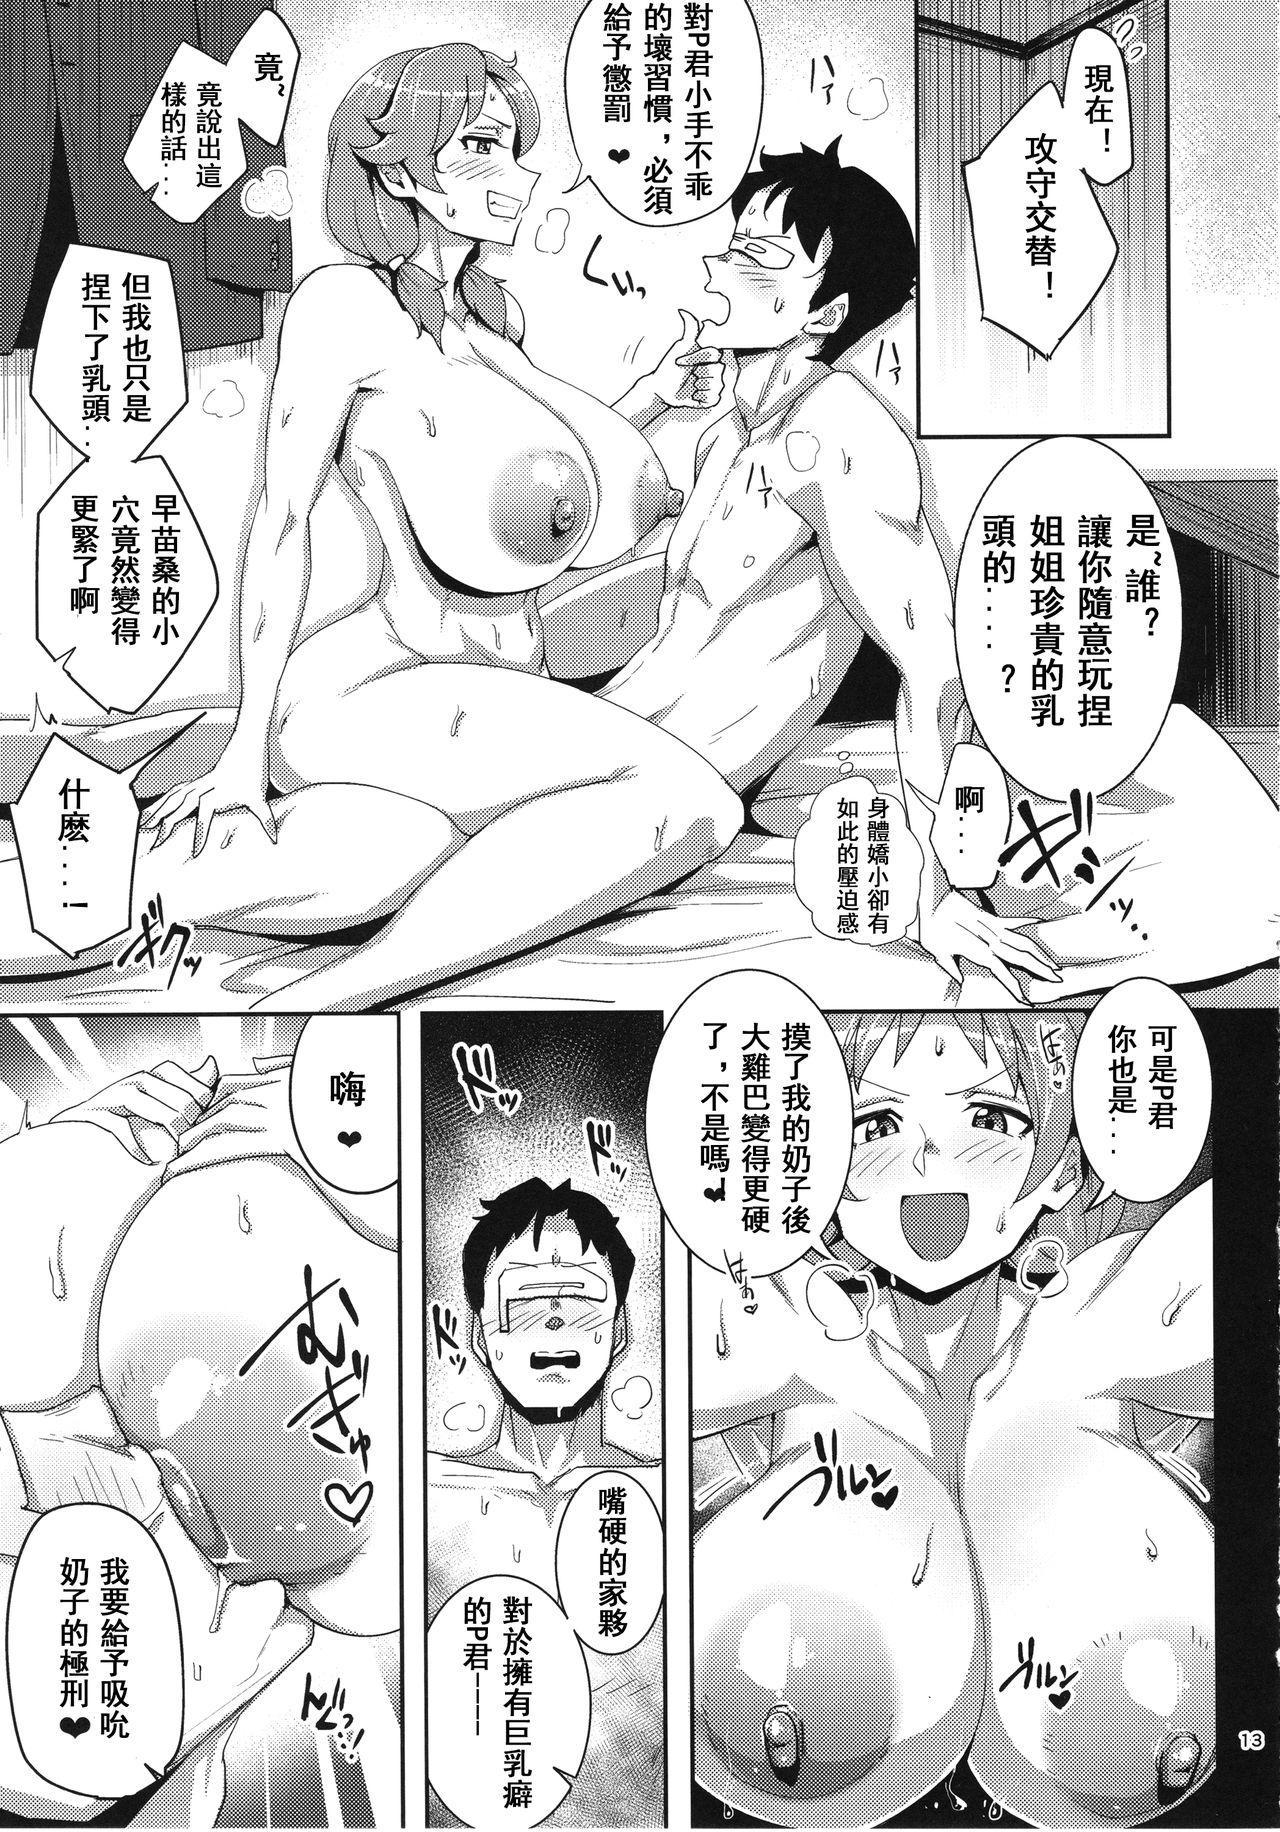 Sanae-san ni Genki ni Shitemorau Hon 12